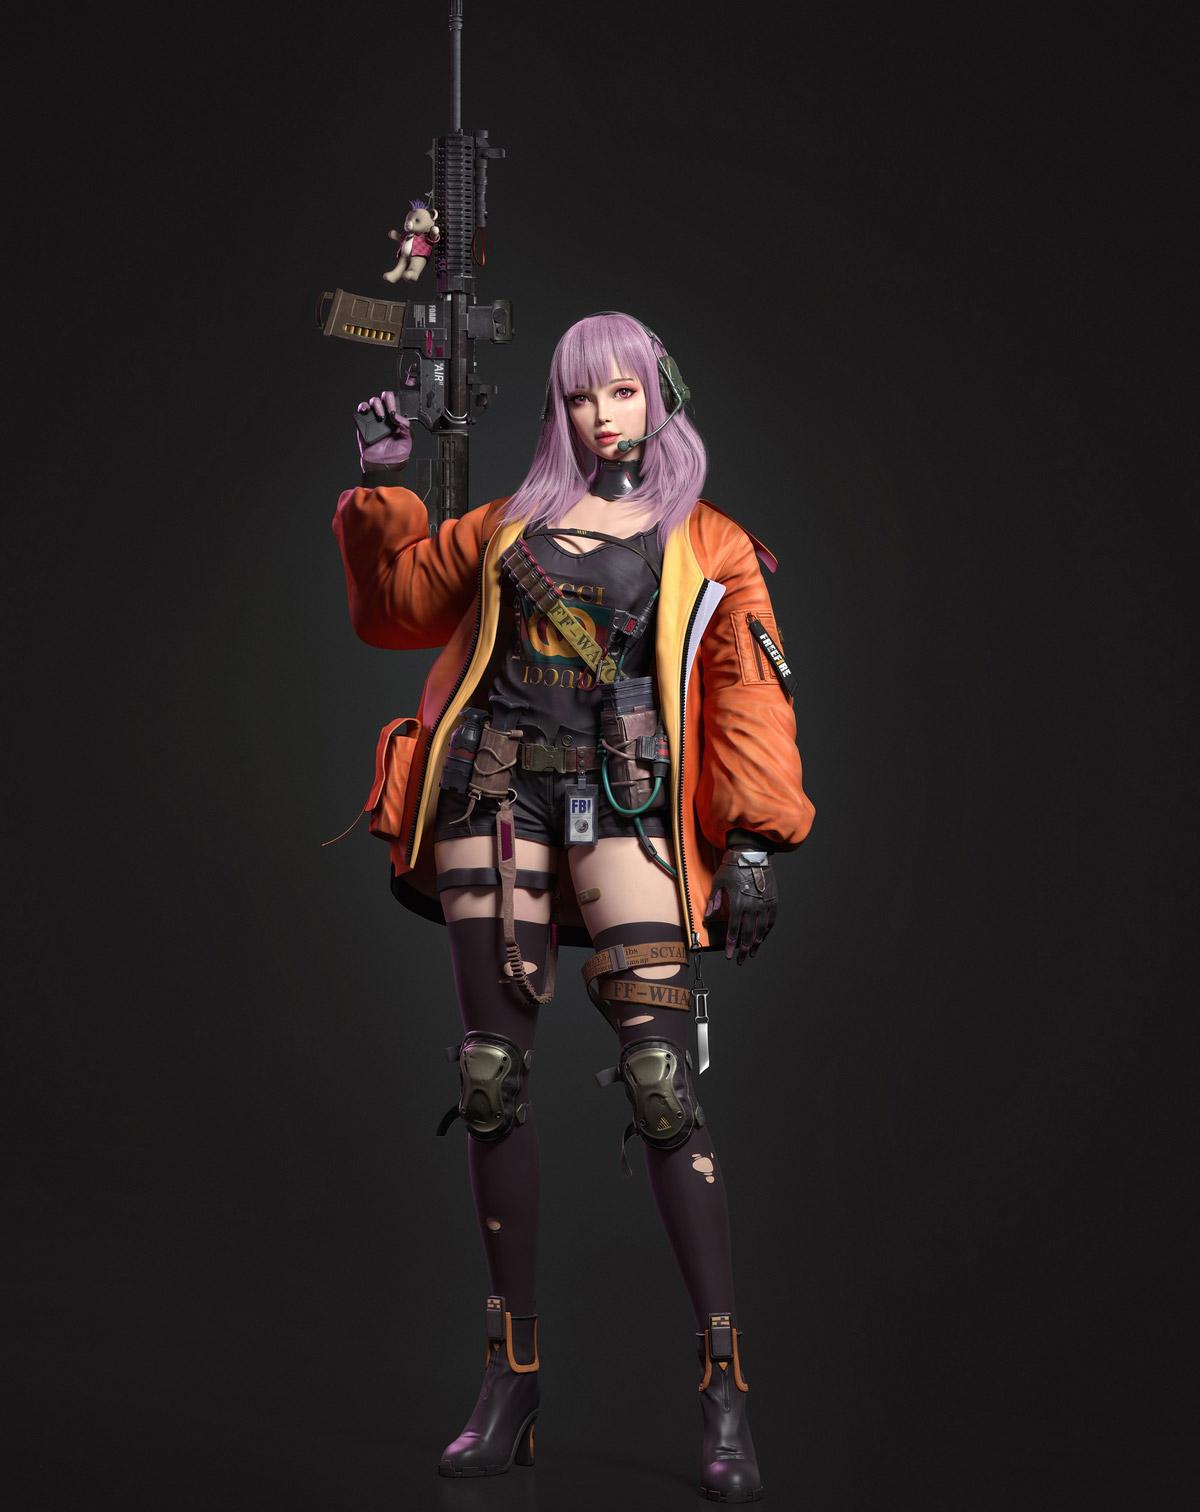 3d model girl fighter gun by ycfcg